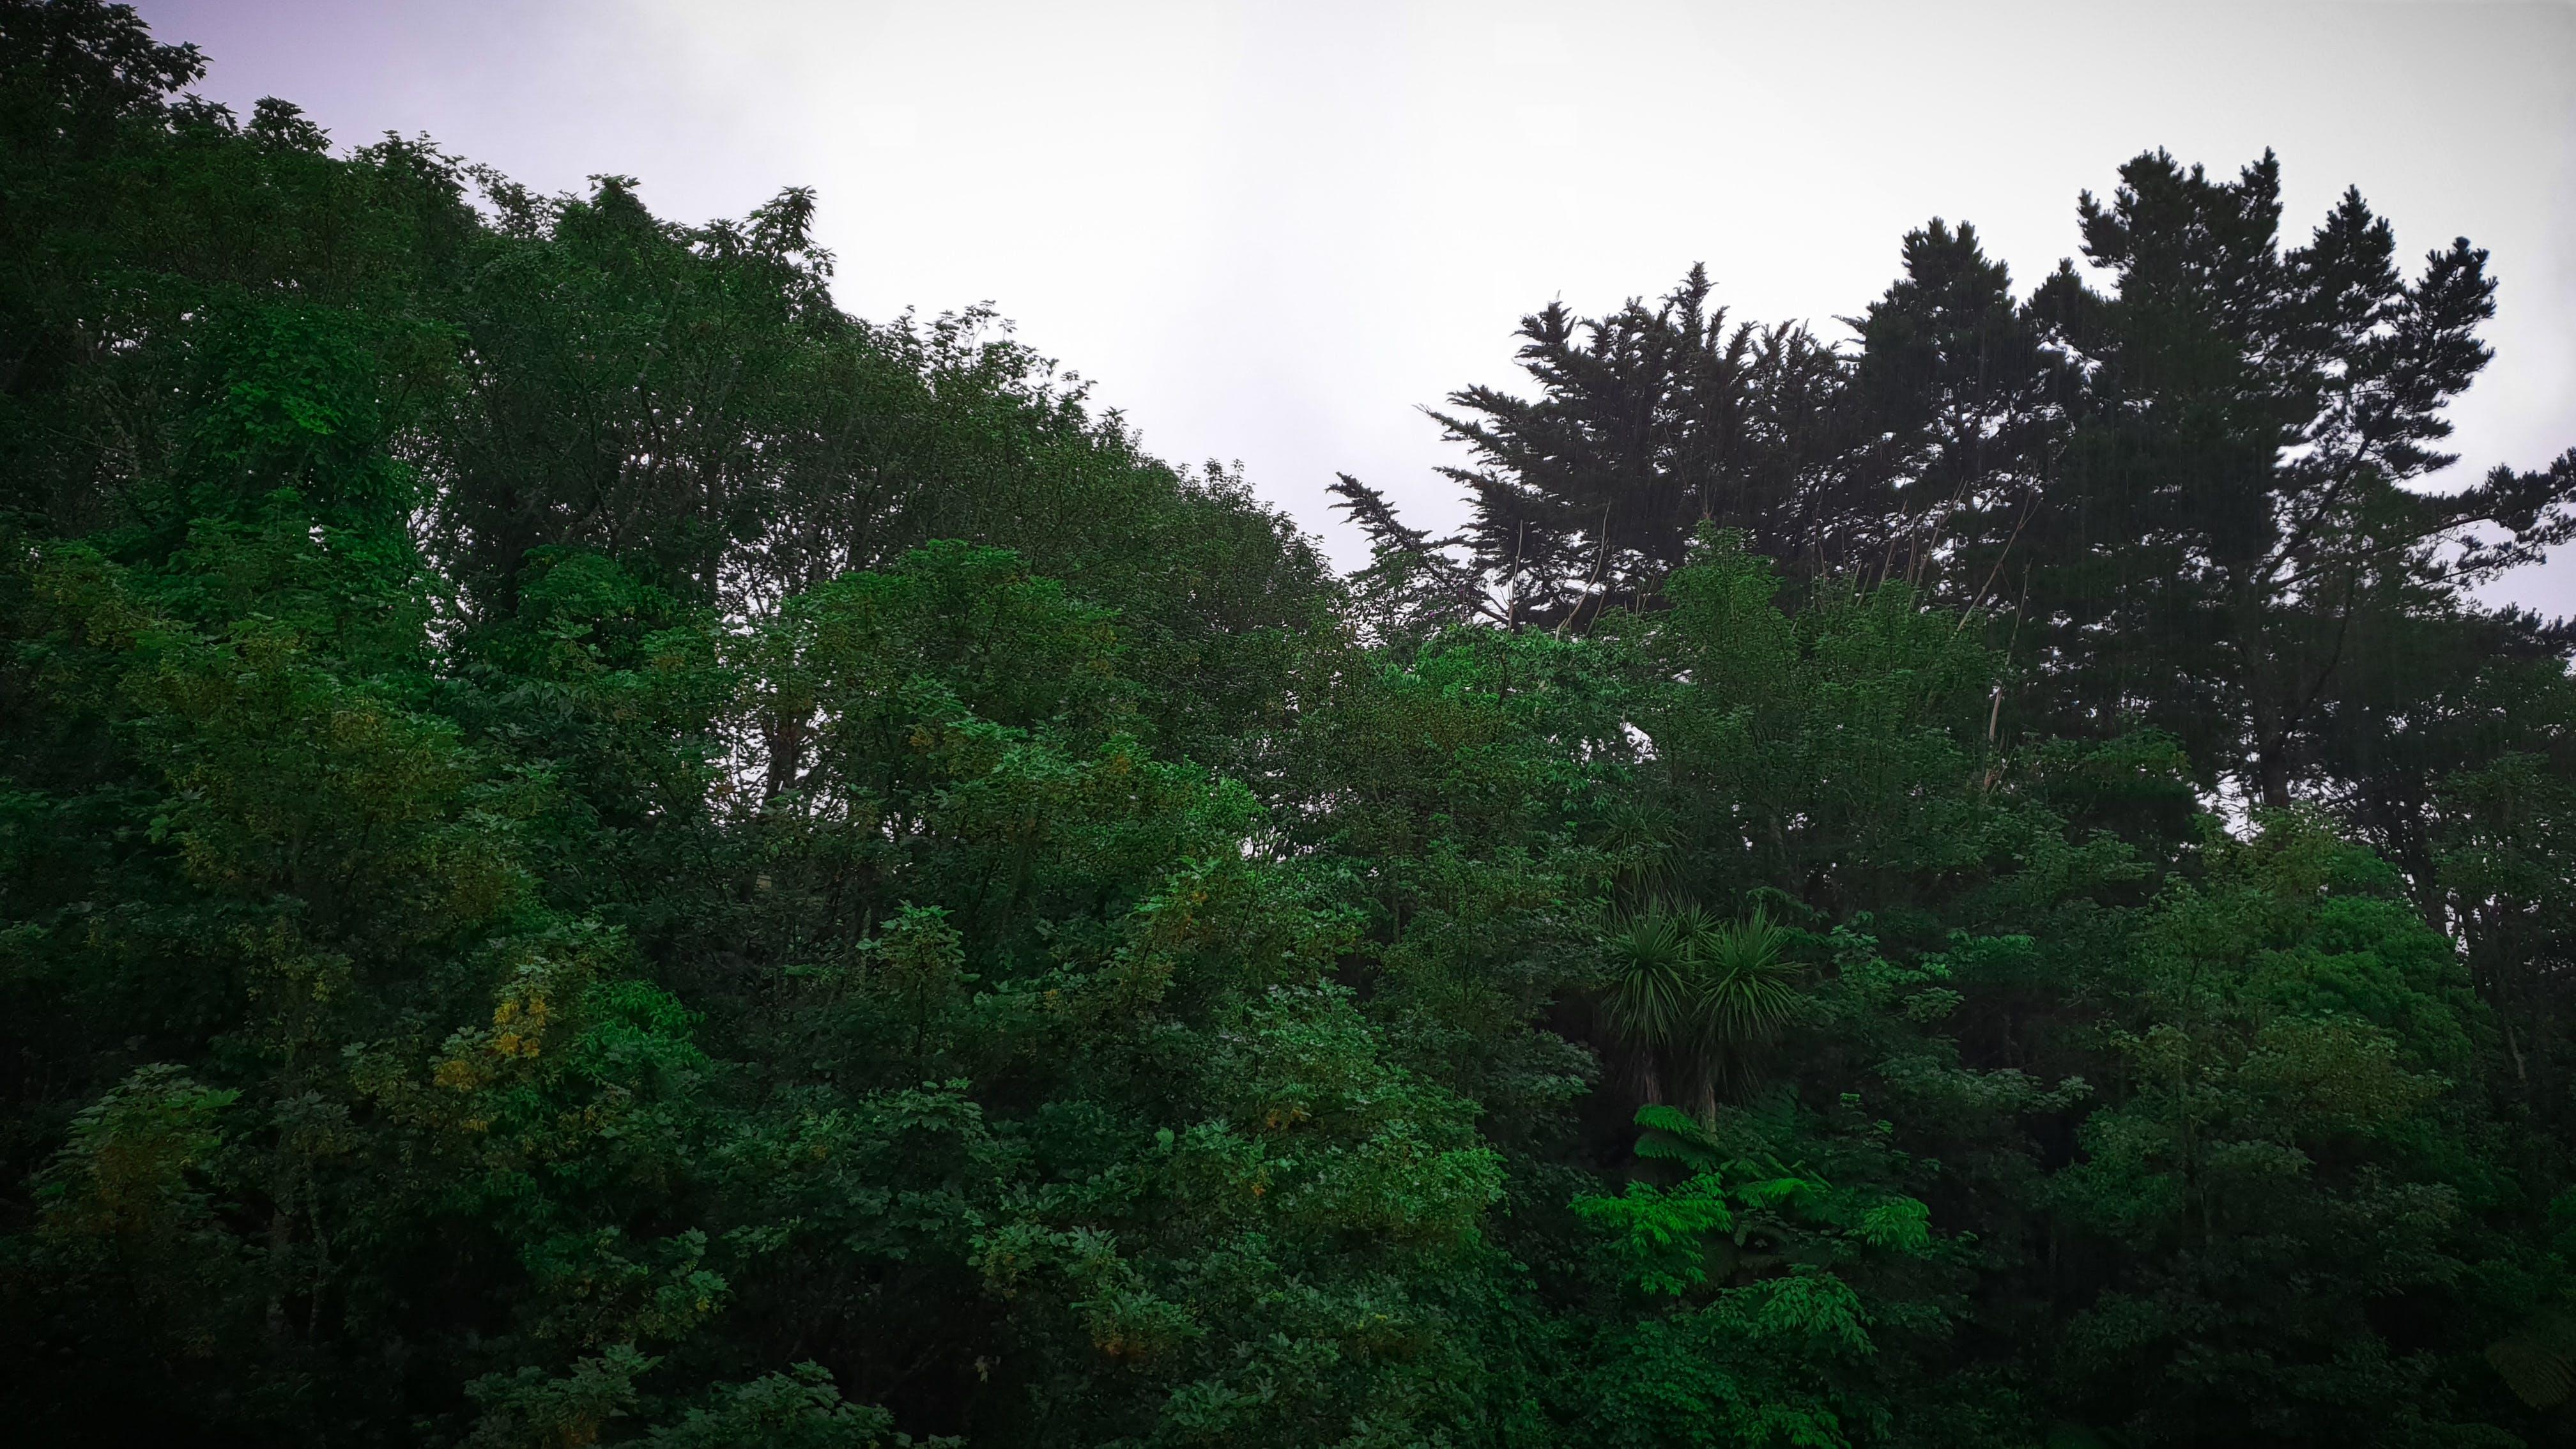 Free stock photo of bush, canopy, cloudy, foliage